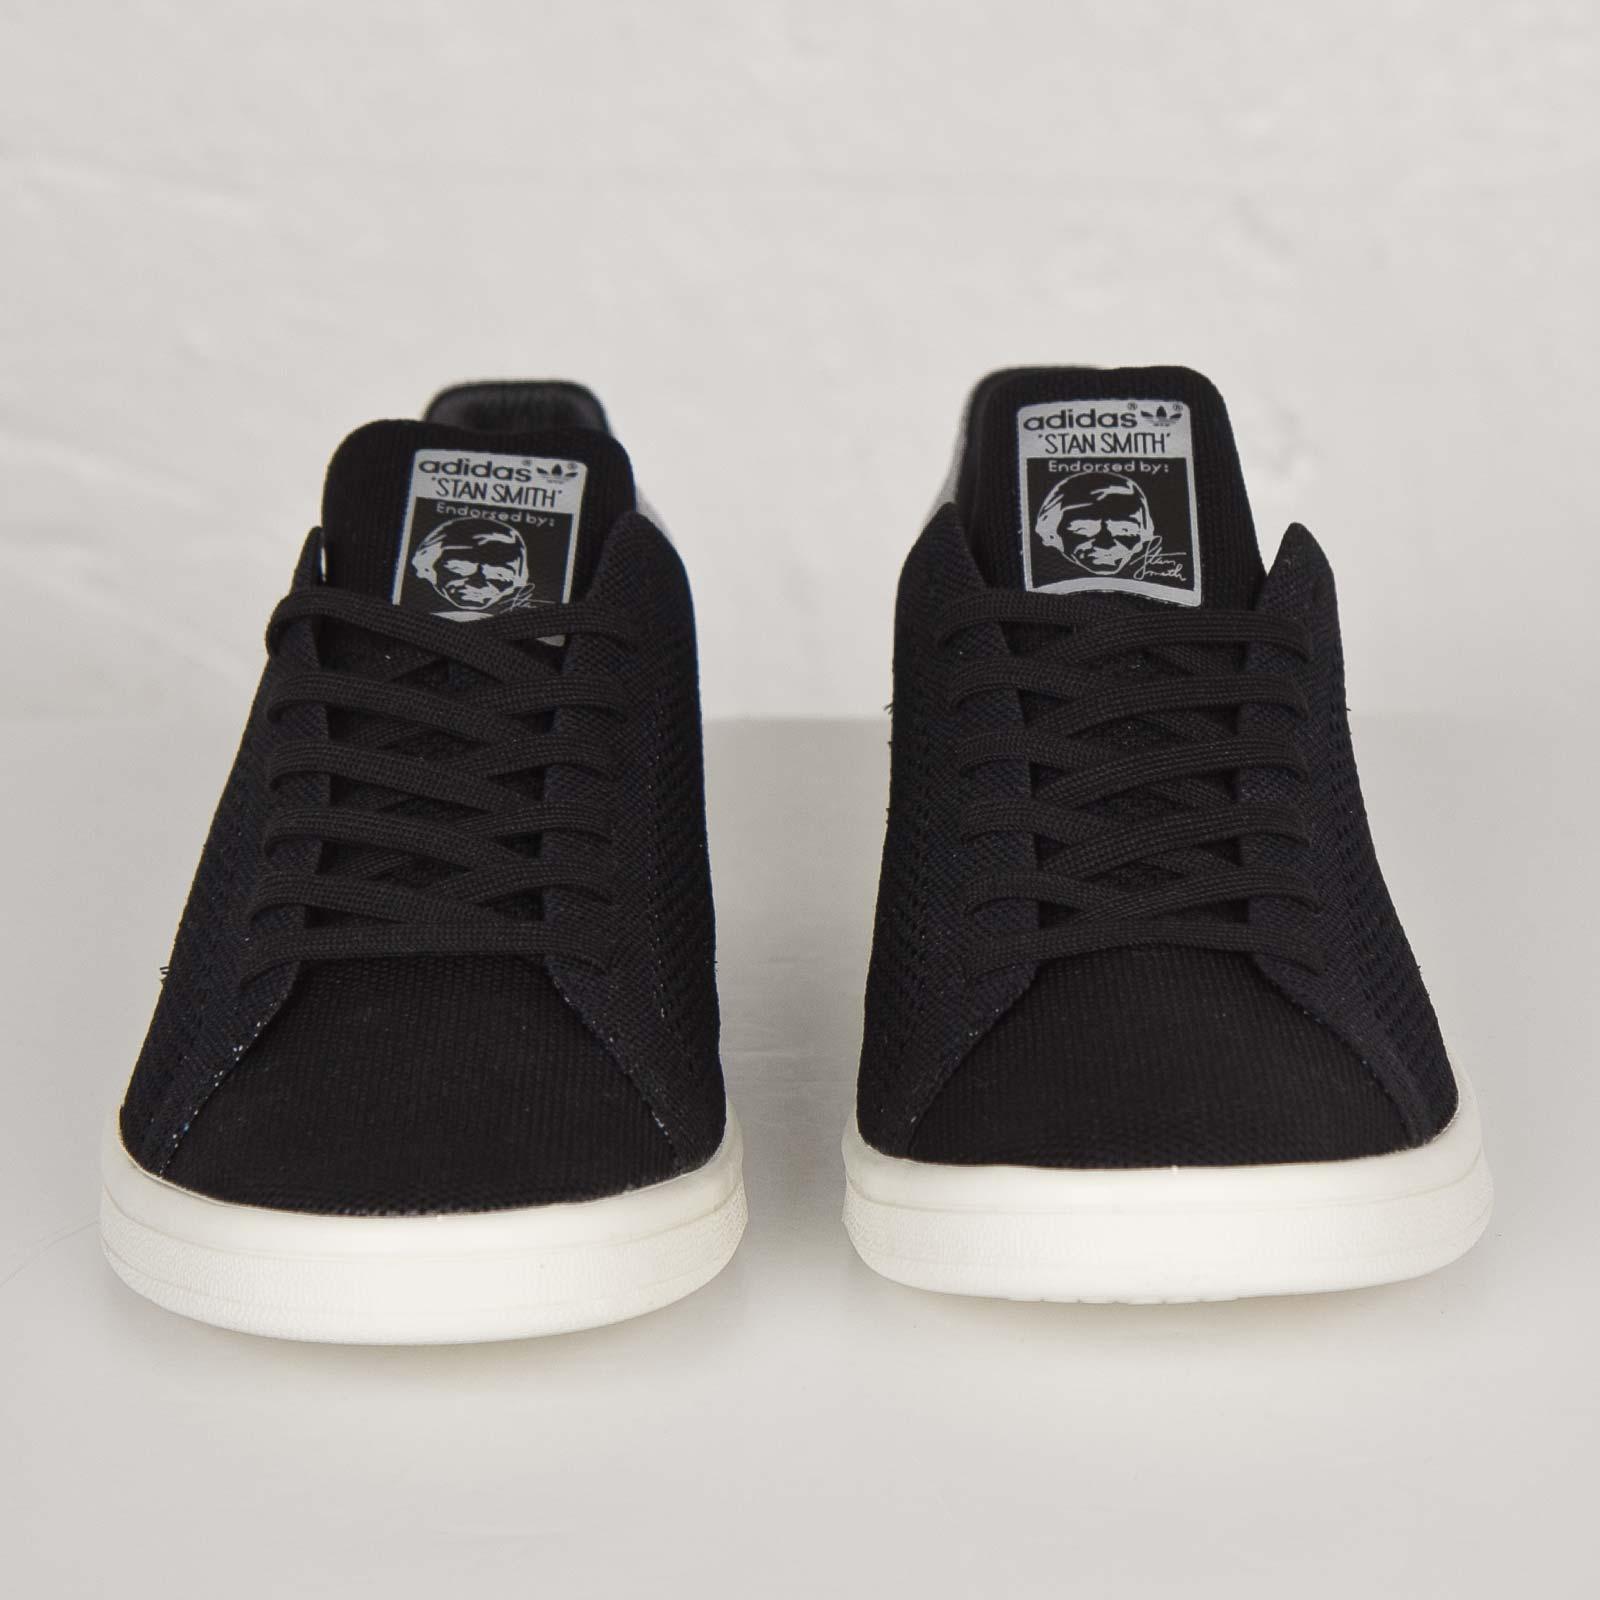 best service a7913 b05c1 good adidas stan smith all black primeknit d3f87 e513e